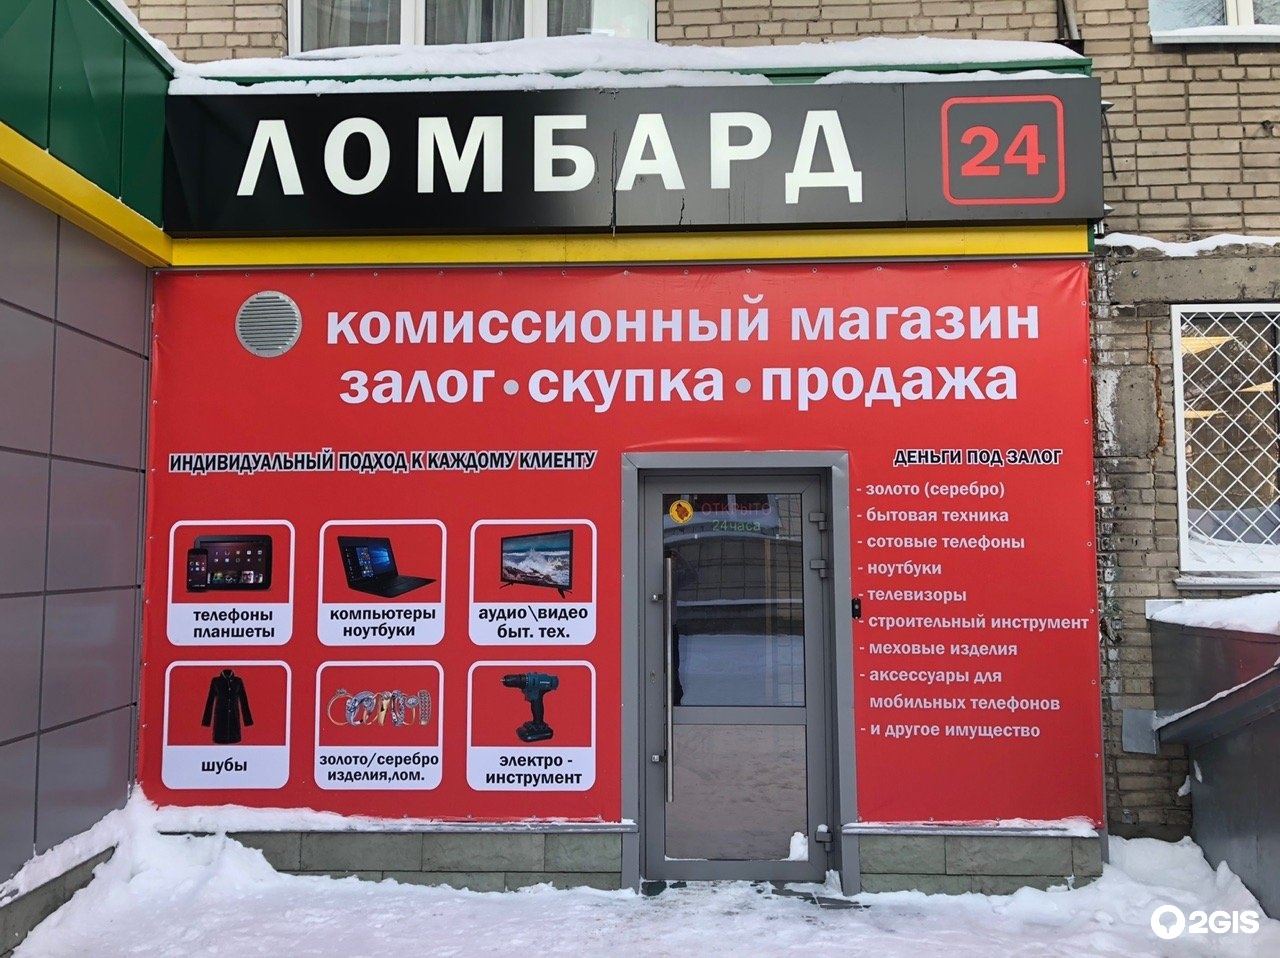 Часа района 24 ломбарды кировского spettacolare duo часы nautica продам